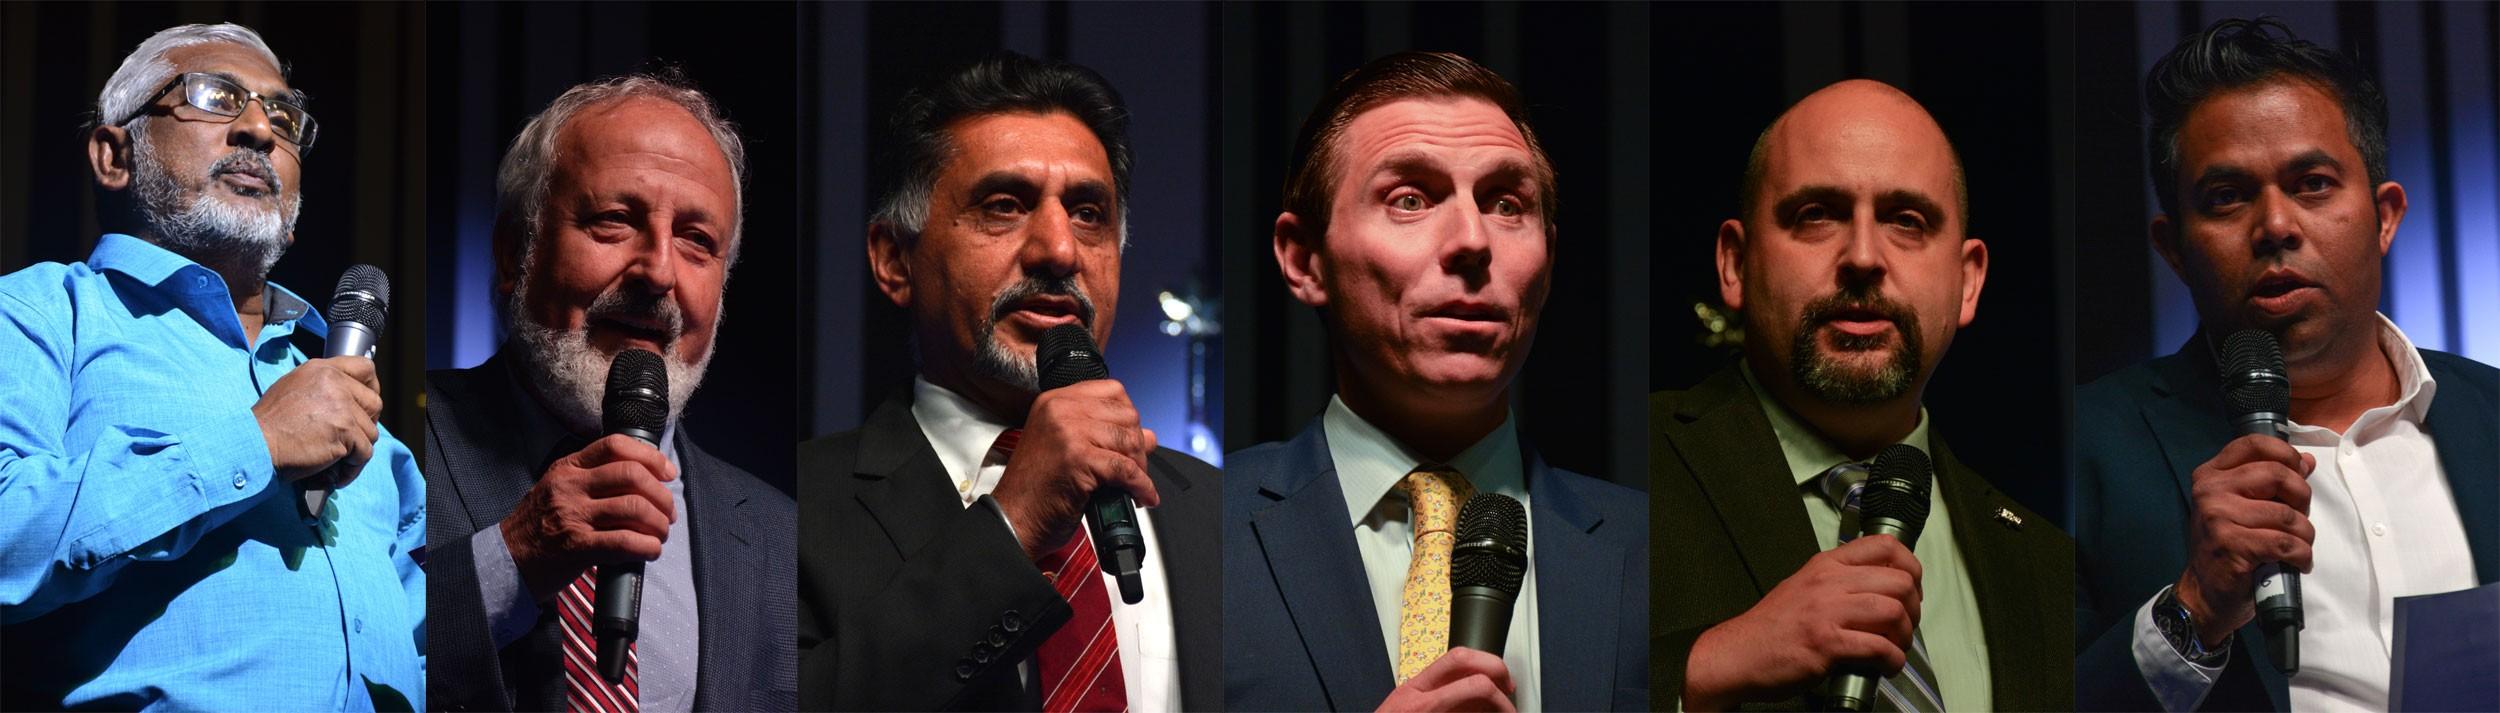 Brown impresses after Jeffrey calls in sick for debate